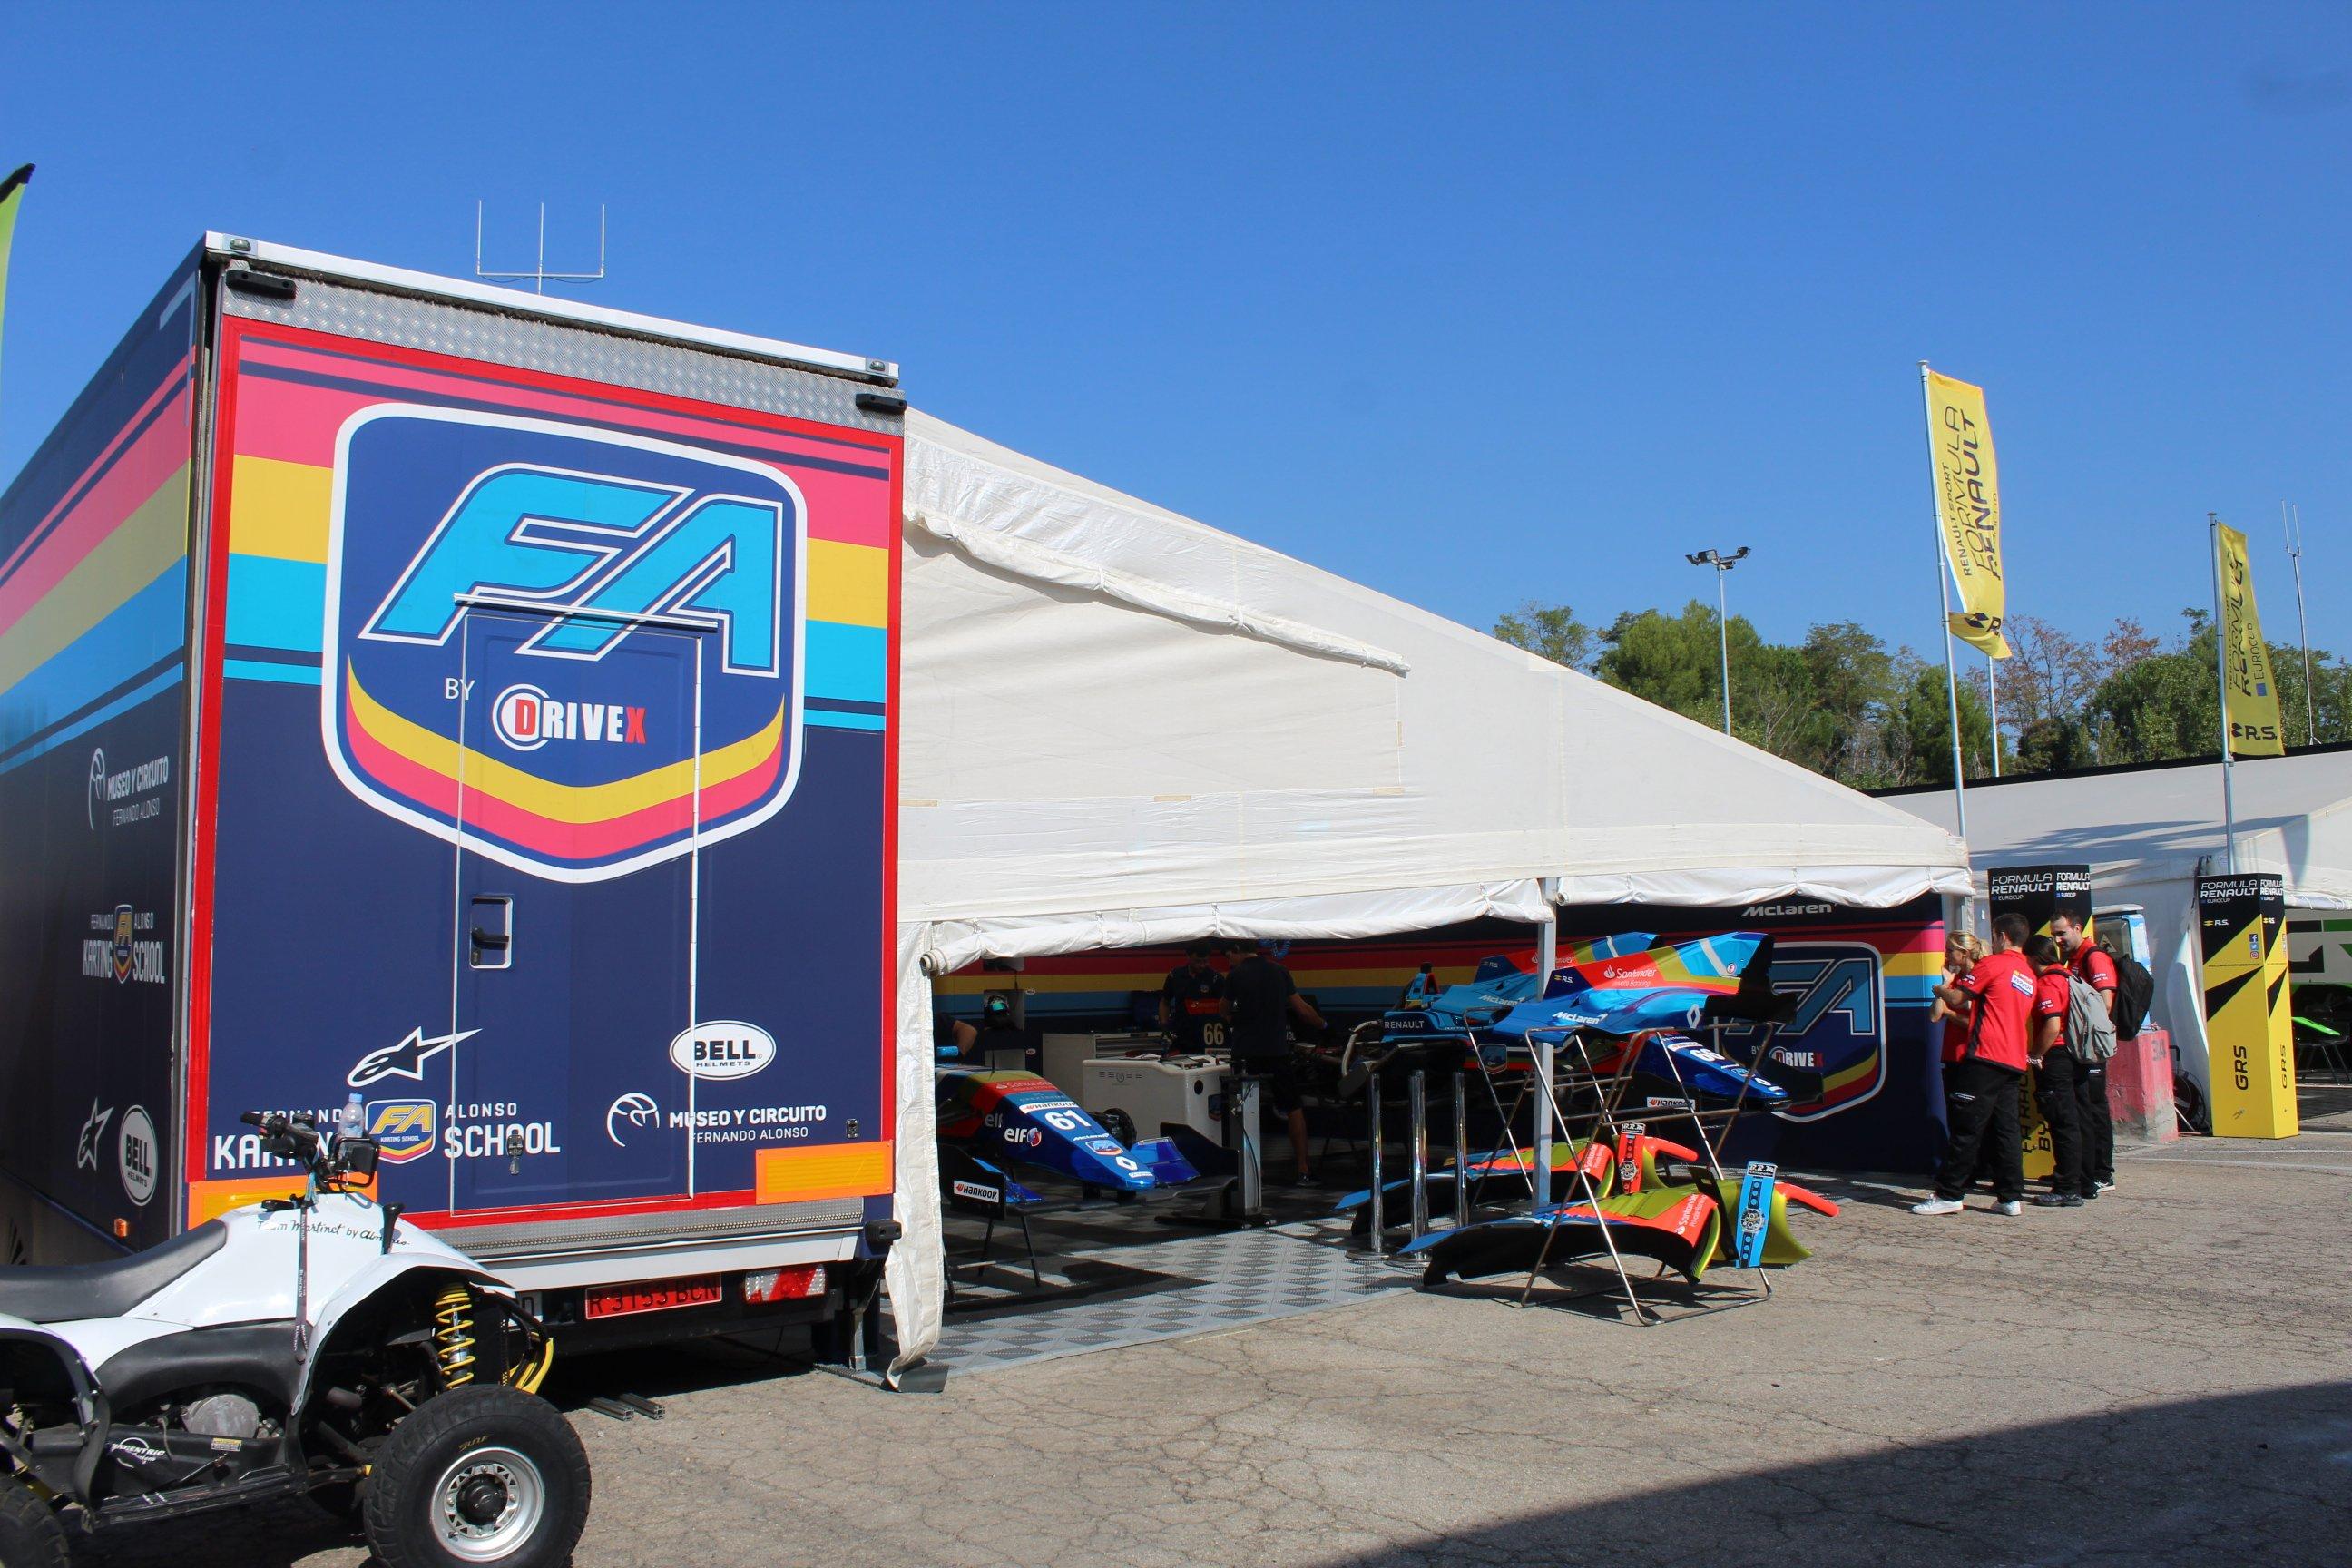 """ФА Рэйсинг"" на гонке Еврокубка Формулы Рено в Барселоне"